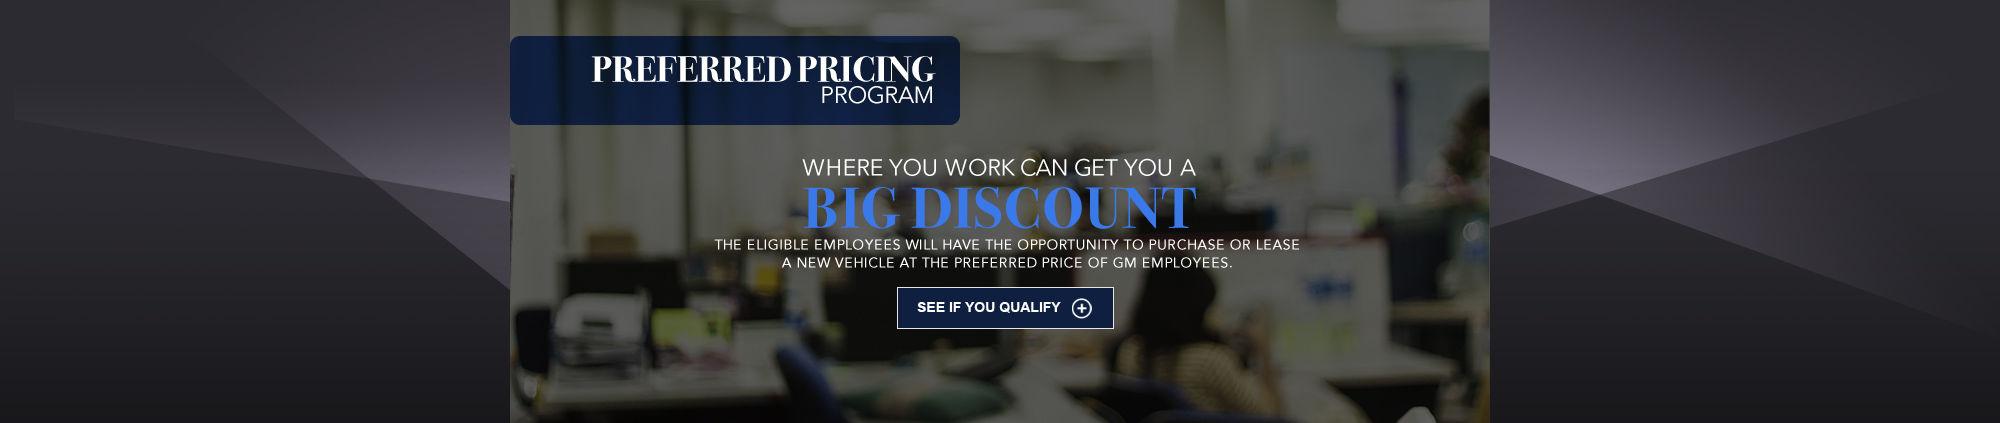 Preferred Pricing Program gm